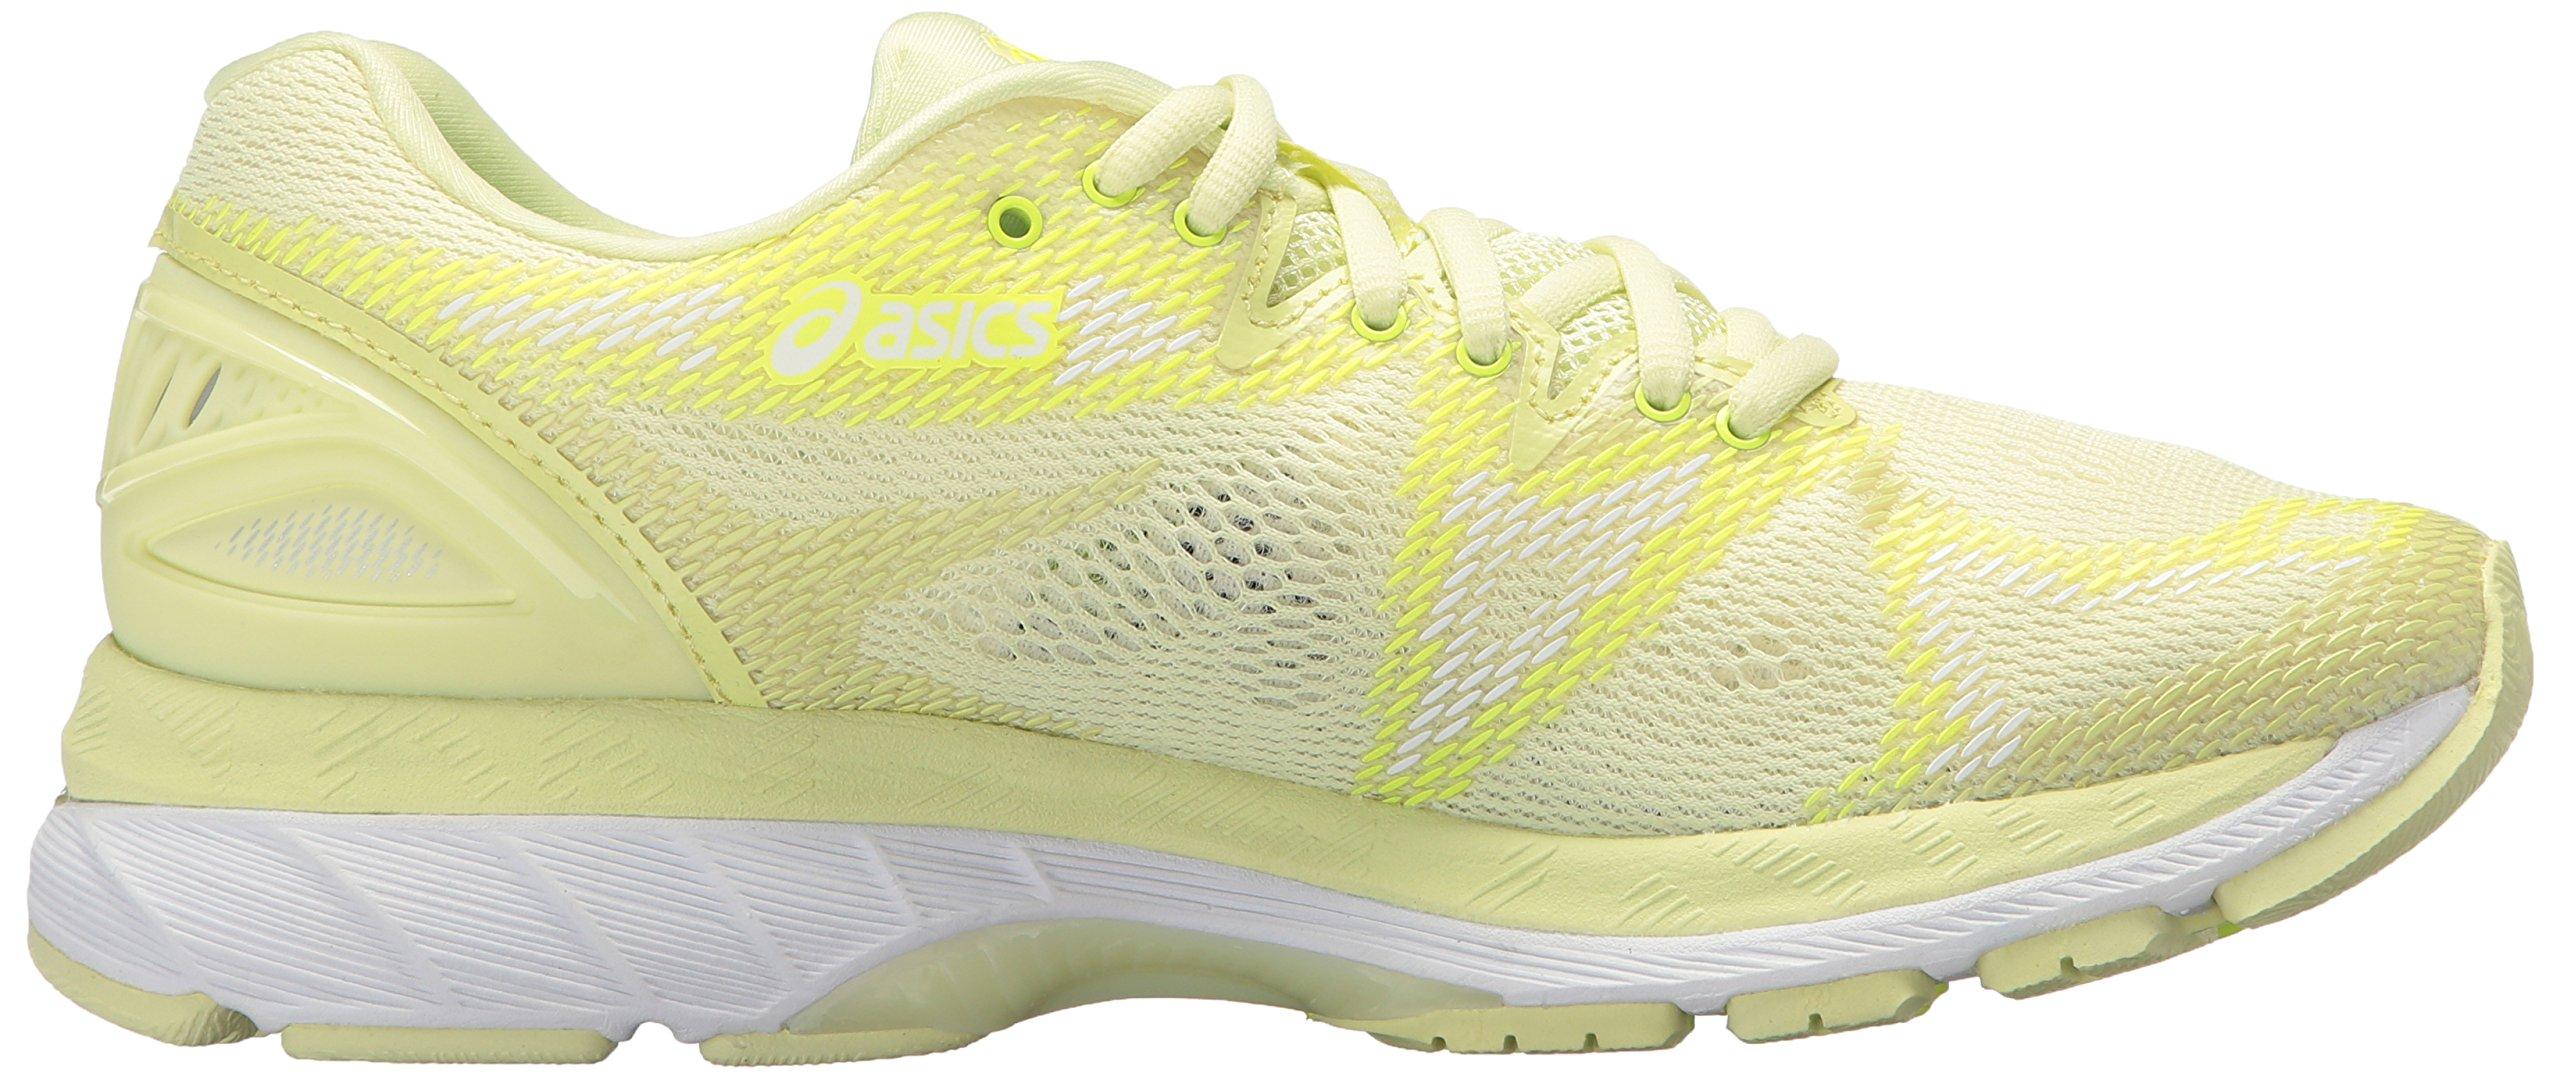 ASICS Women's Gel-Nimbus 20 Running Shoe, limelight/limelight/safety yellow, 5.5 Medium US by ASICS (Image #6)